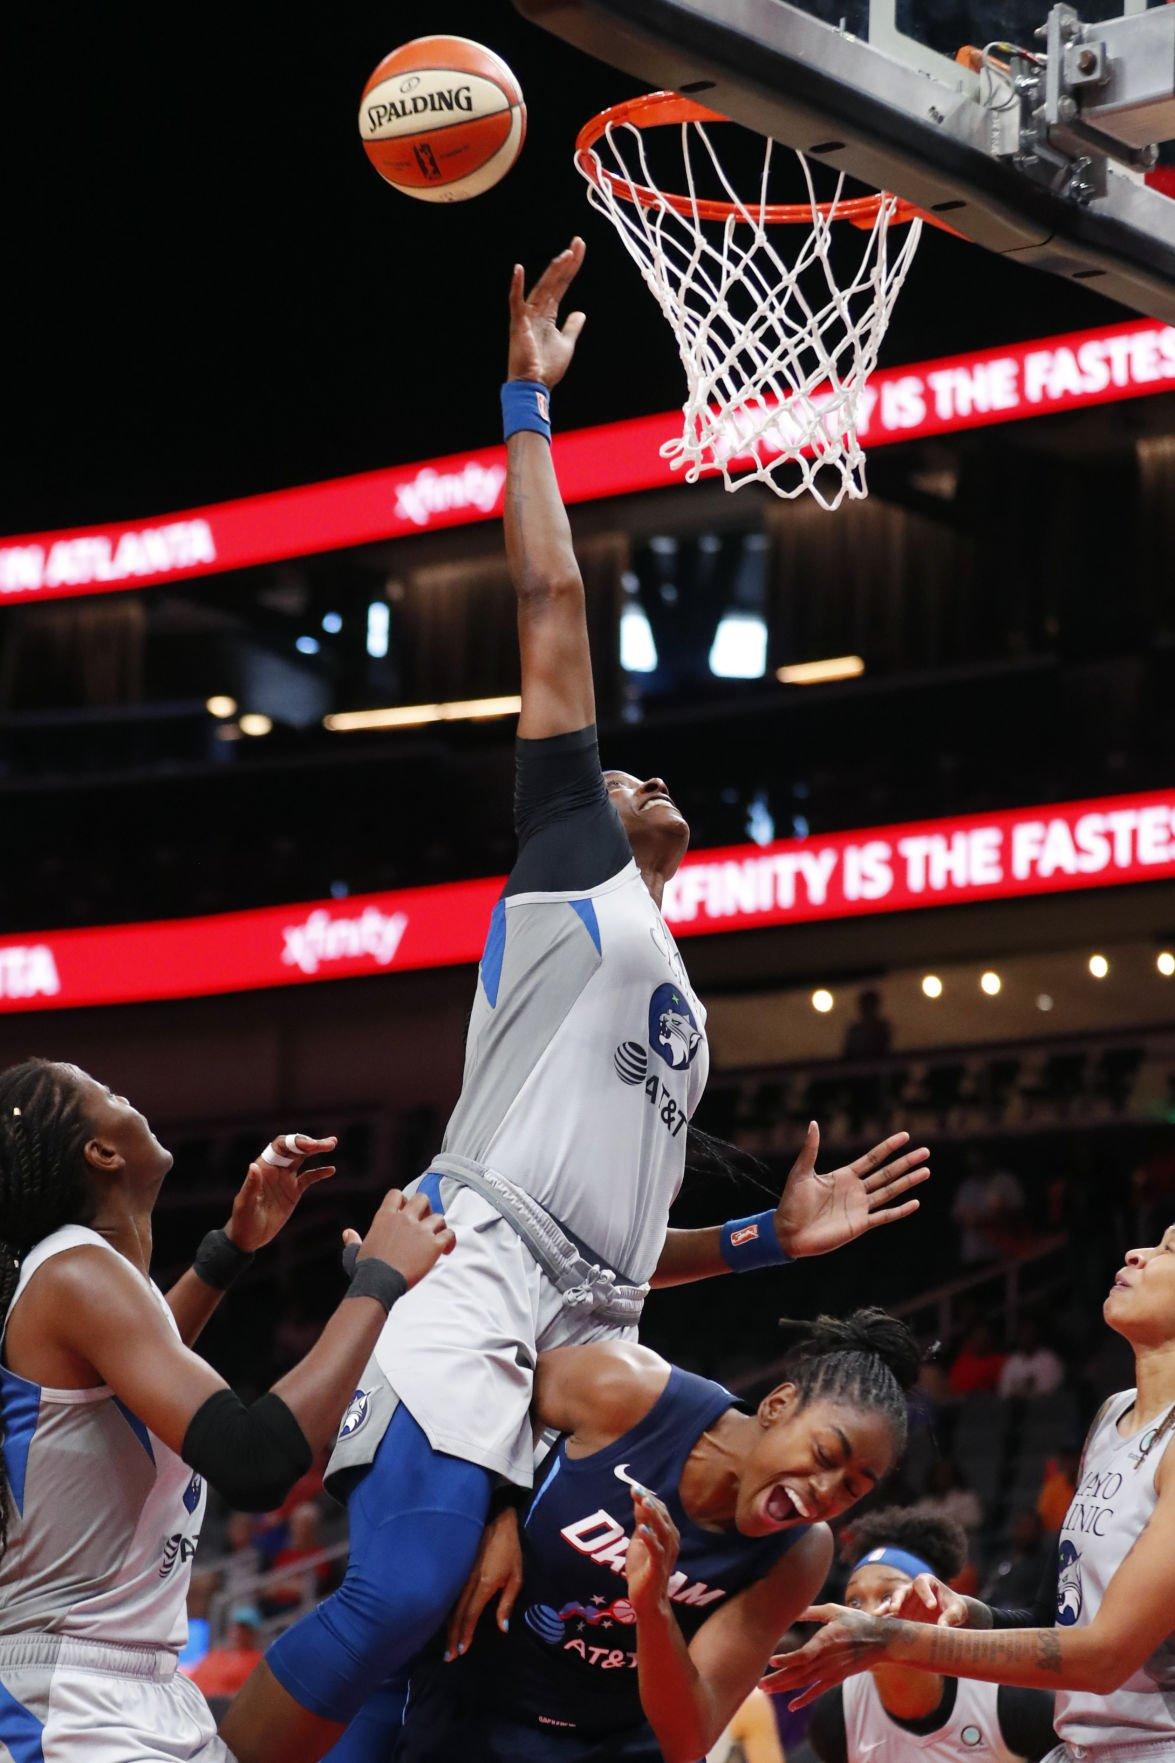 Lynx Dream Basketball